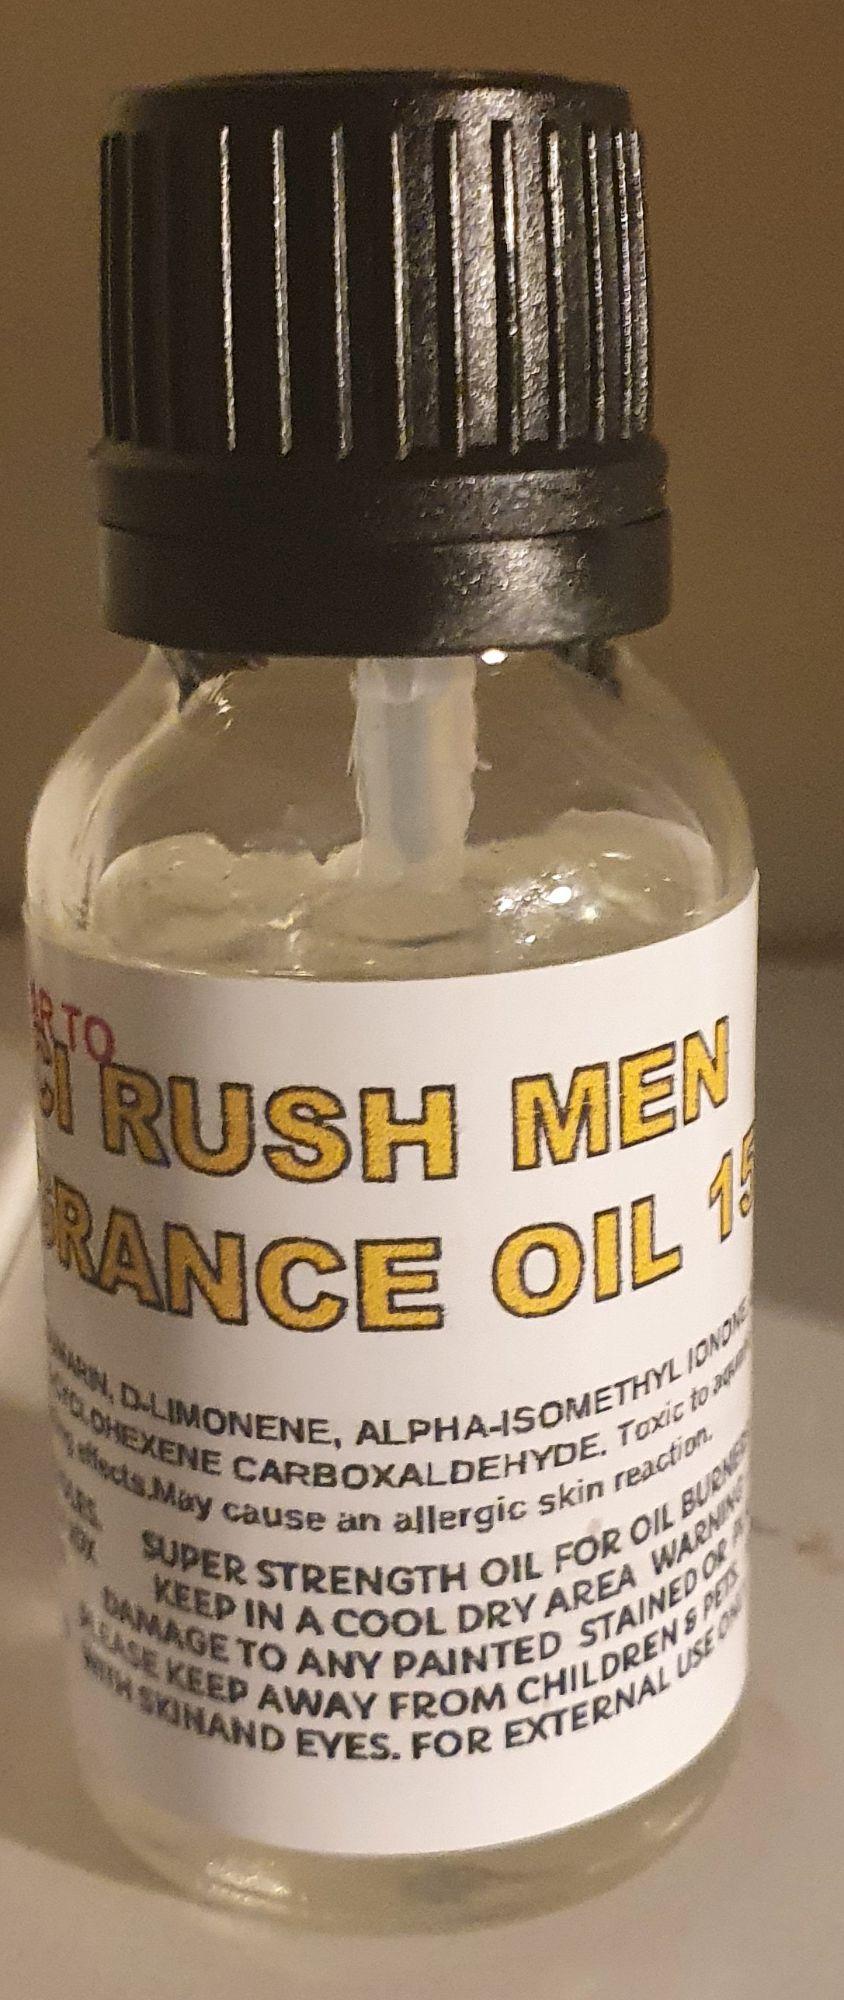 GUCCI RUSH MAN (SIMILAR TO) DESIGNER FRAGRANCE DIFFUSER OIL